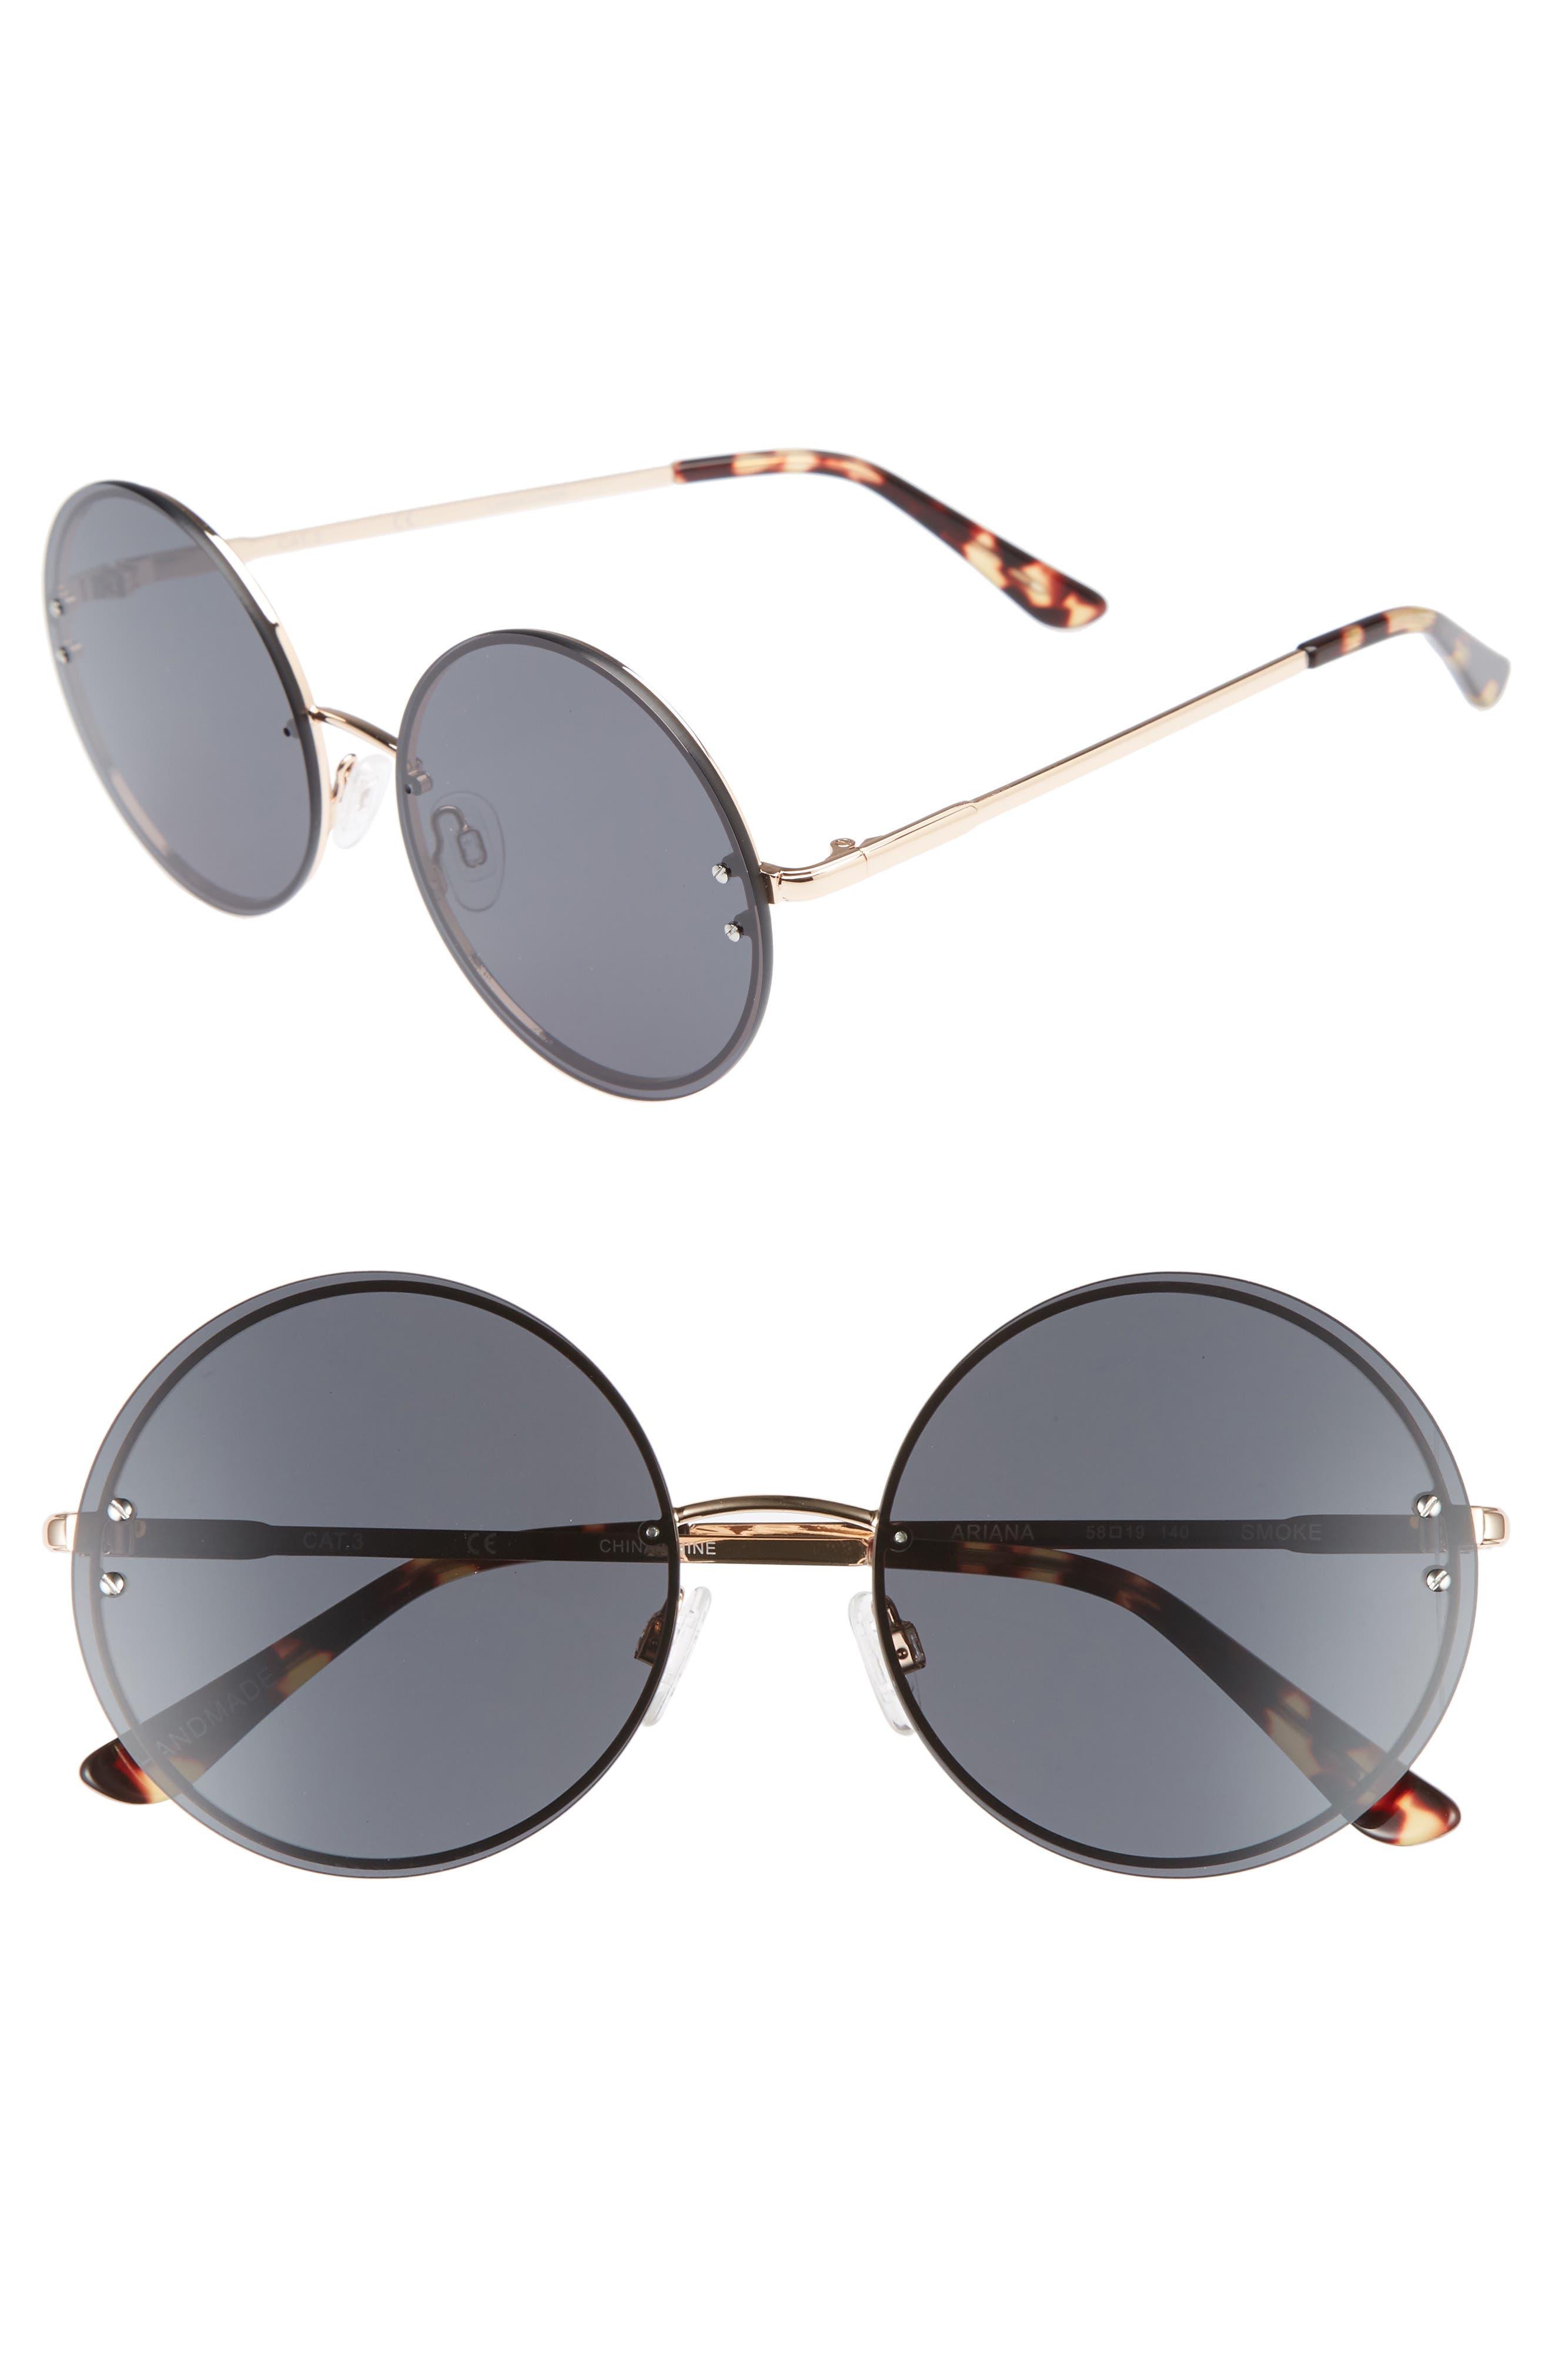 Ariana 58mm Round Sunglasses,                             Main thumbnail 1, color,                             SOLID SMOKE